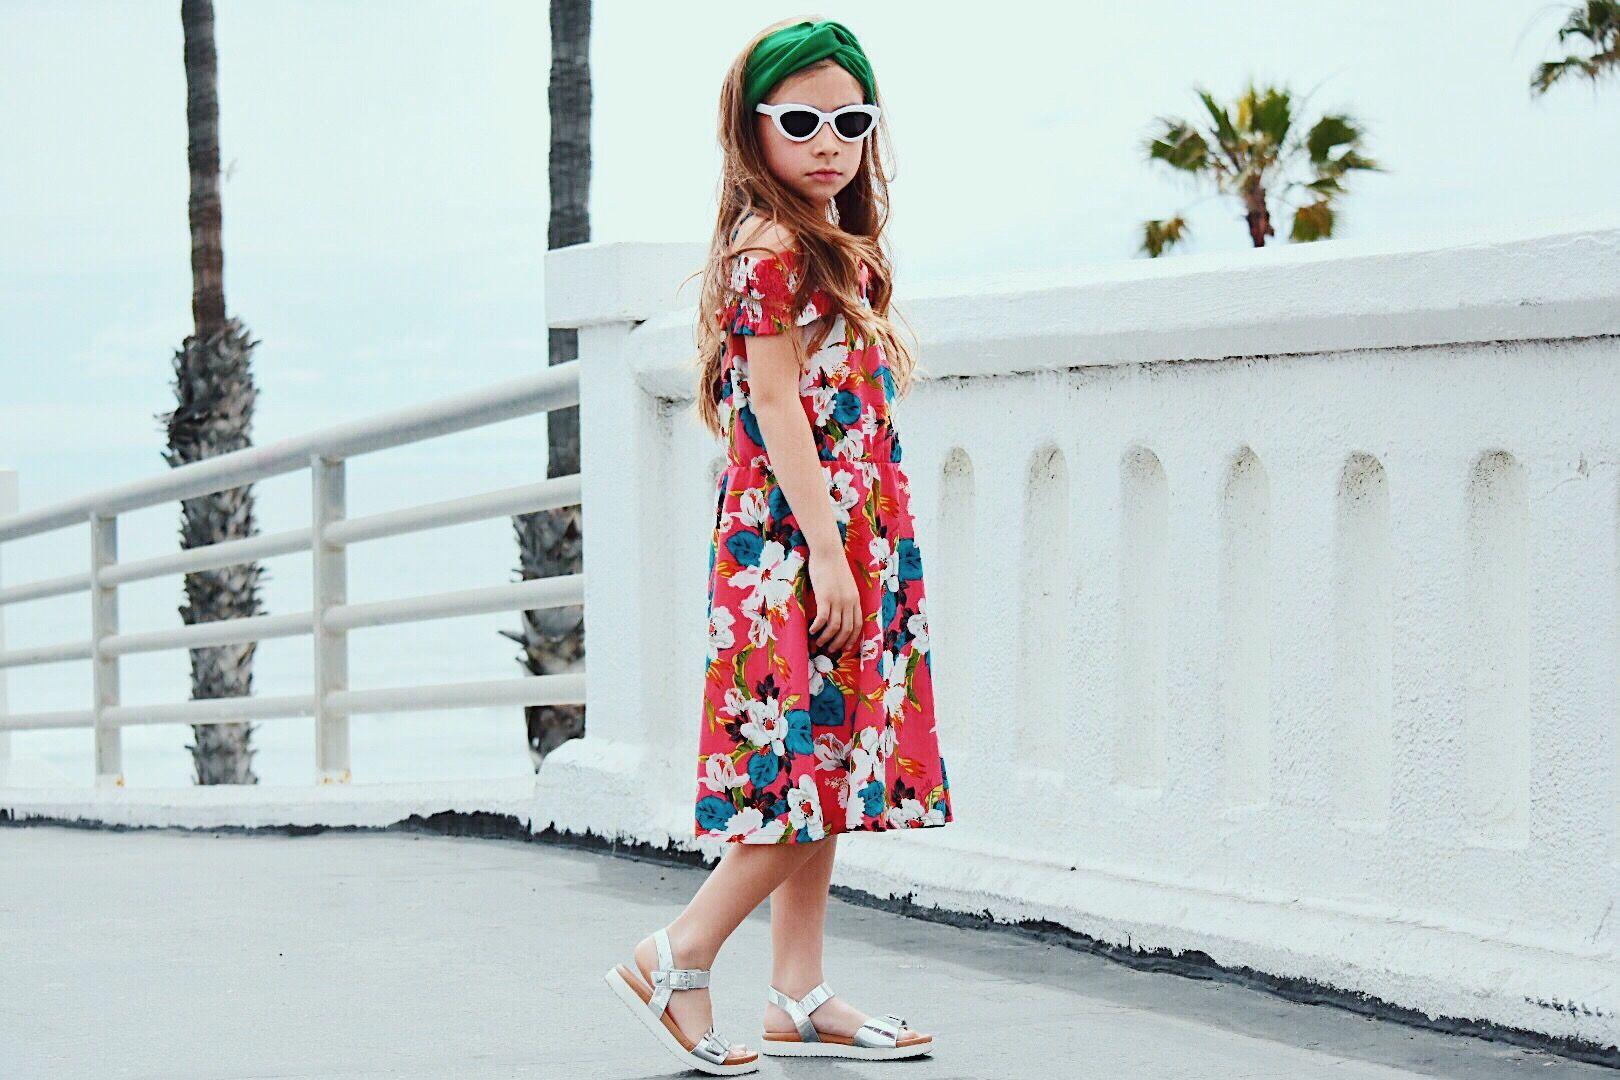 94d053a58d53 Summer Ready ☀ Dress  Guess Kids Sandals  Nina Kid Shoes Headband   Forever  21 Sunnies  HM kids Fashionista